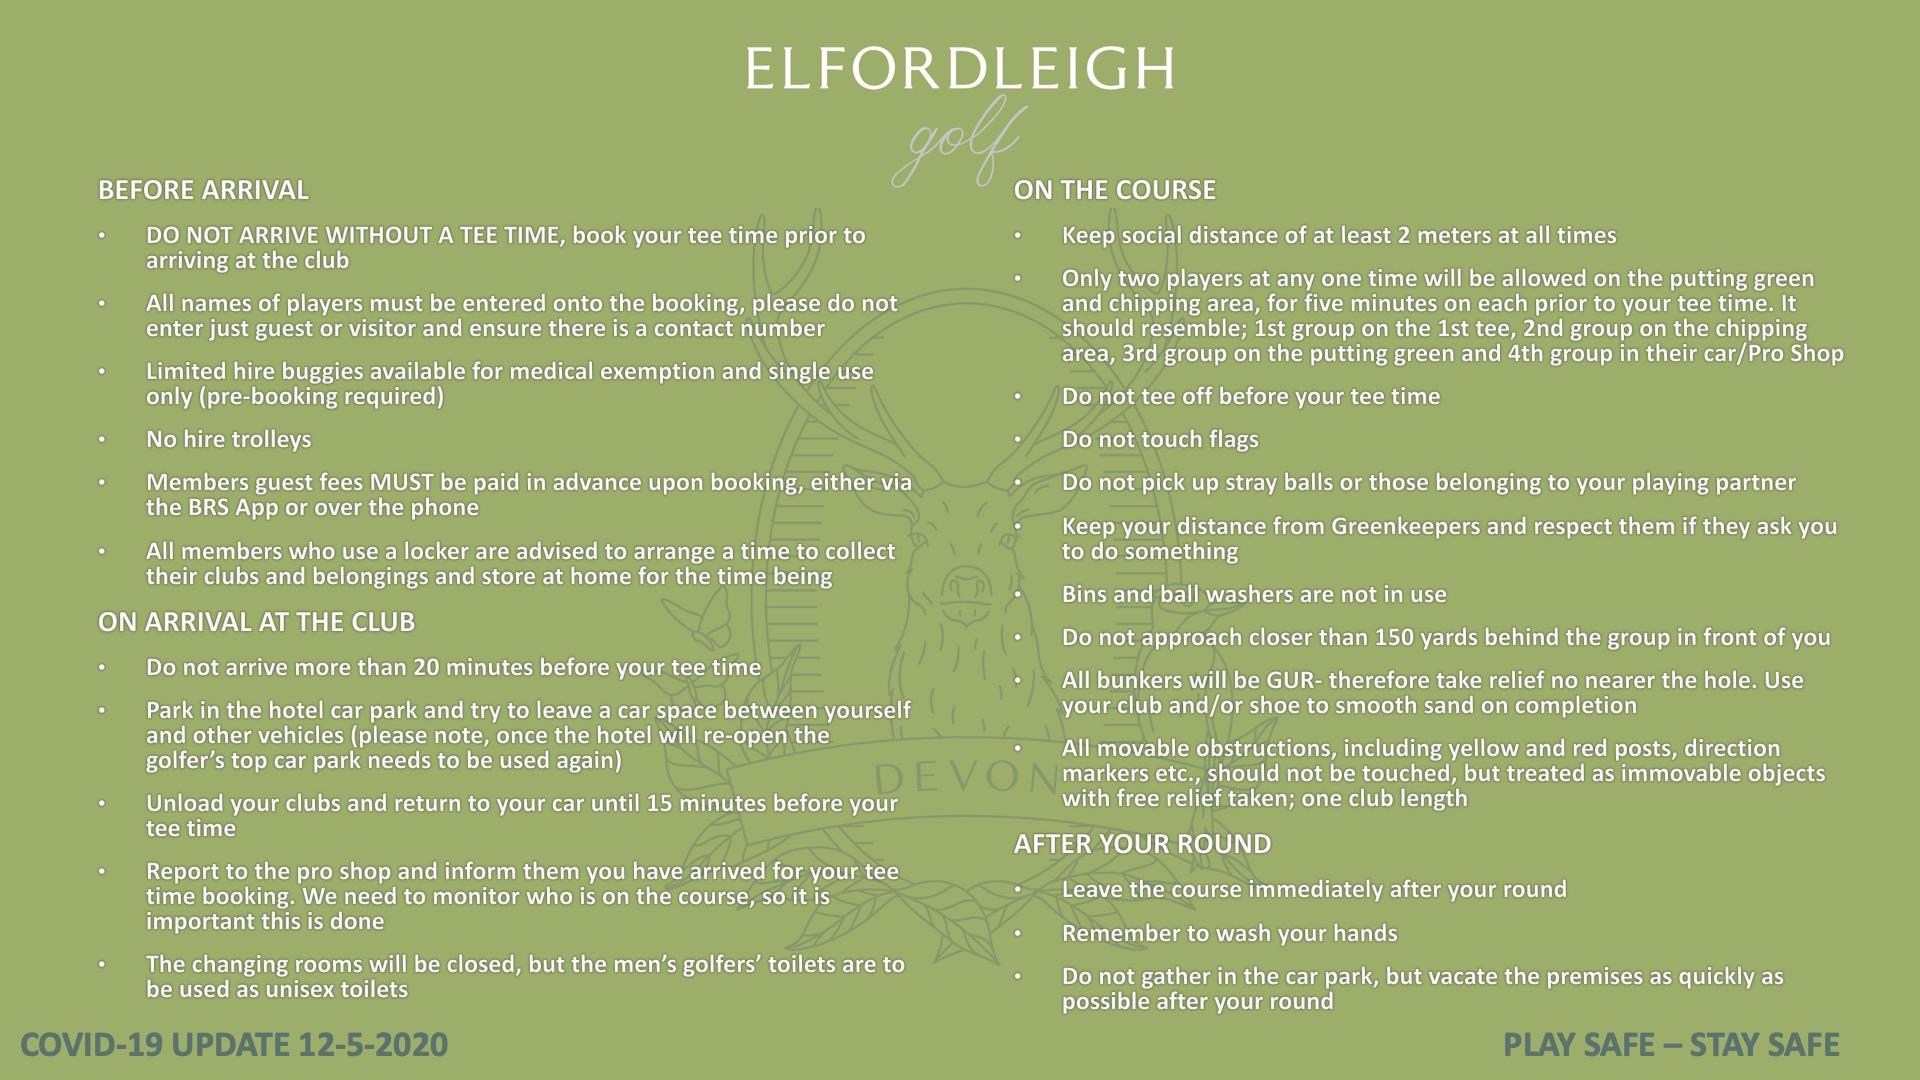 COVID-19 UPDATE ELFORDLEIGH